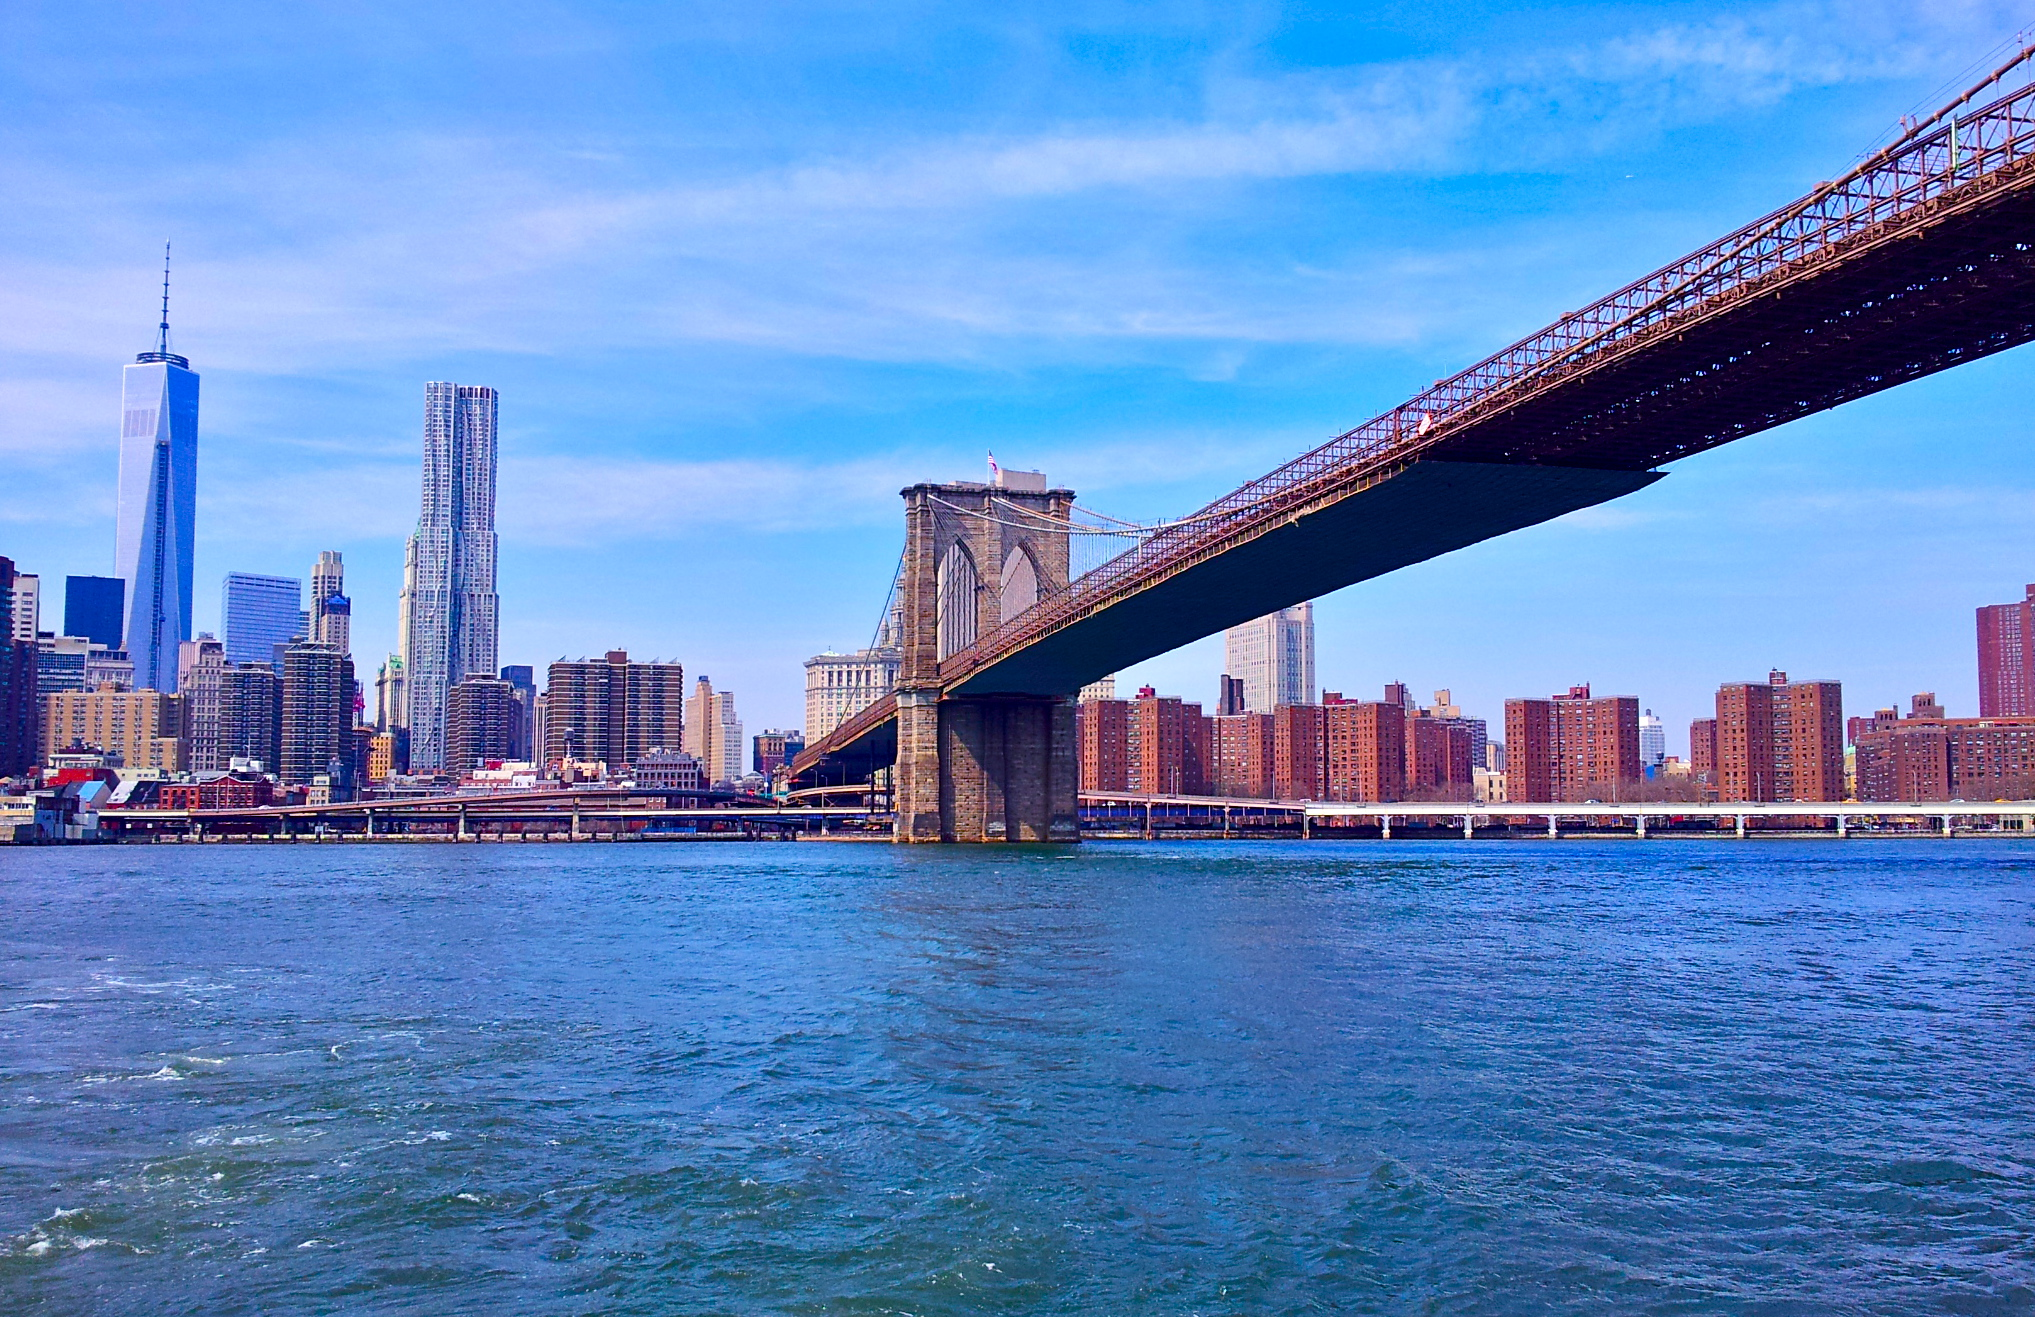 The most famous bridge in the world - The Brooklyn Bridge.